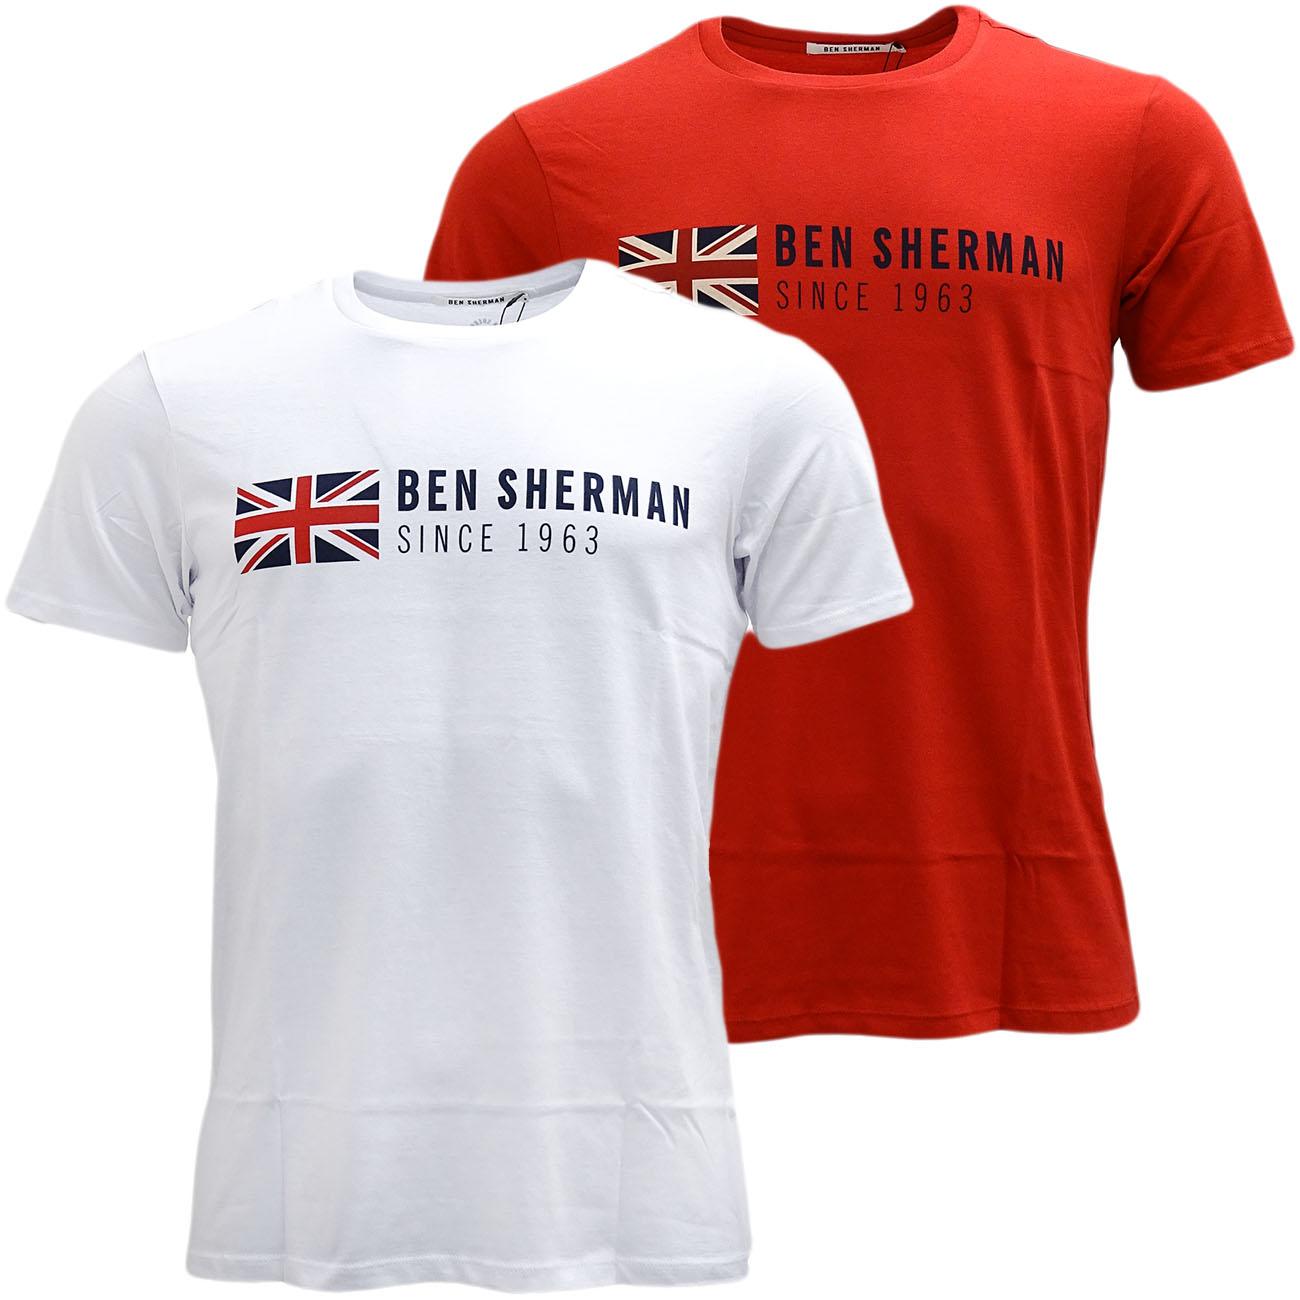 ben sherman tshirt mb12874 ebay